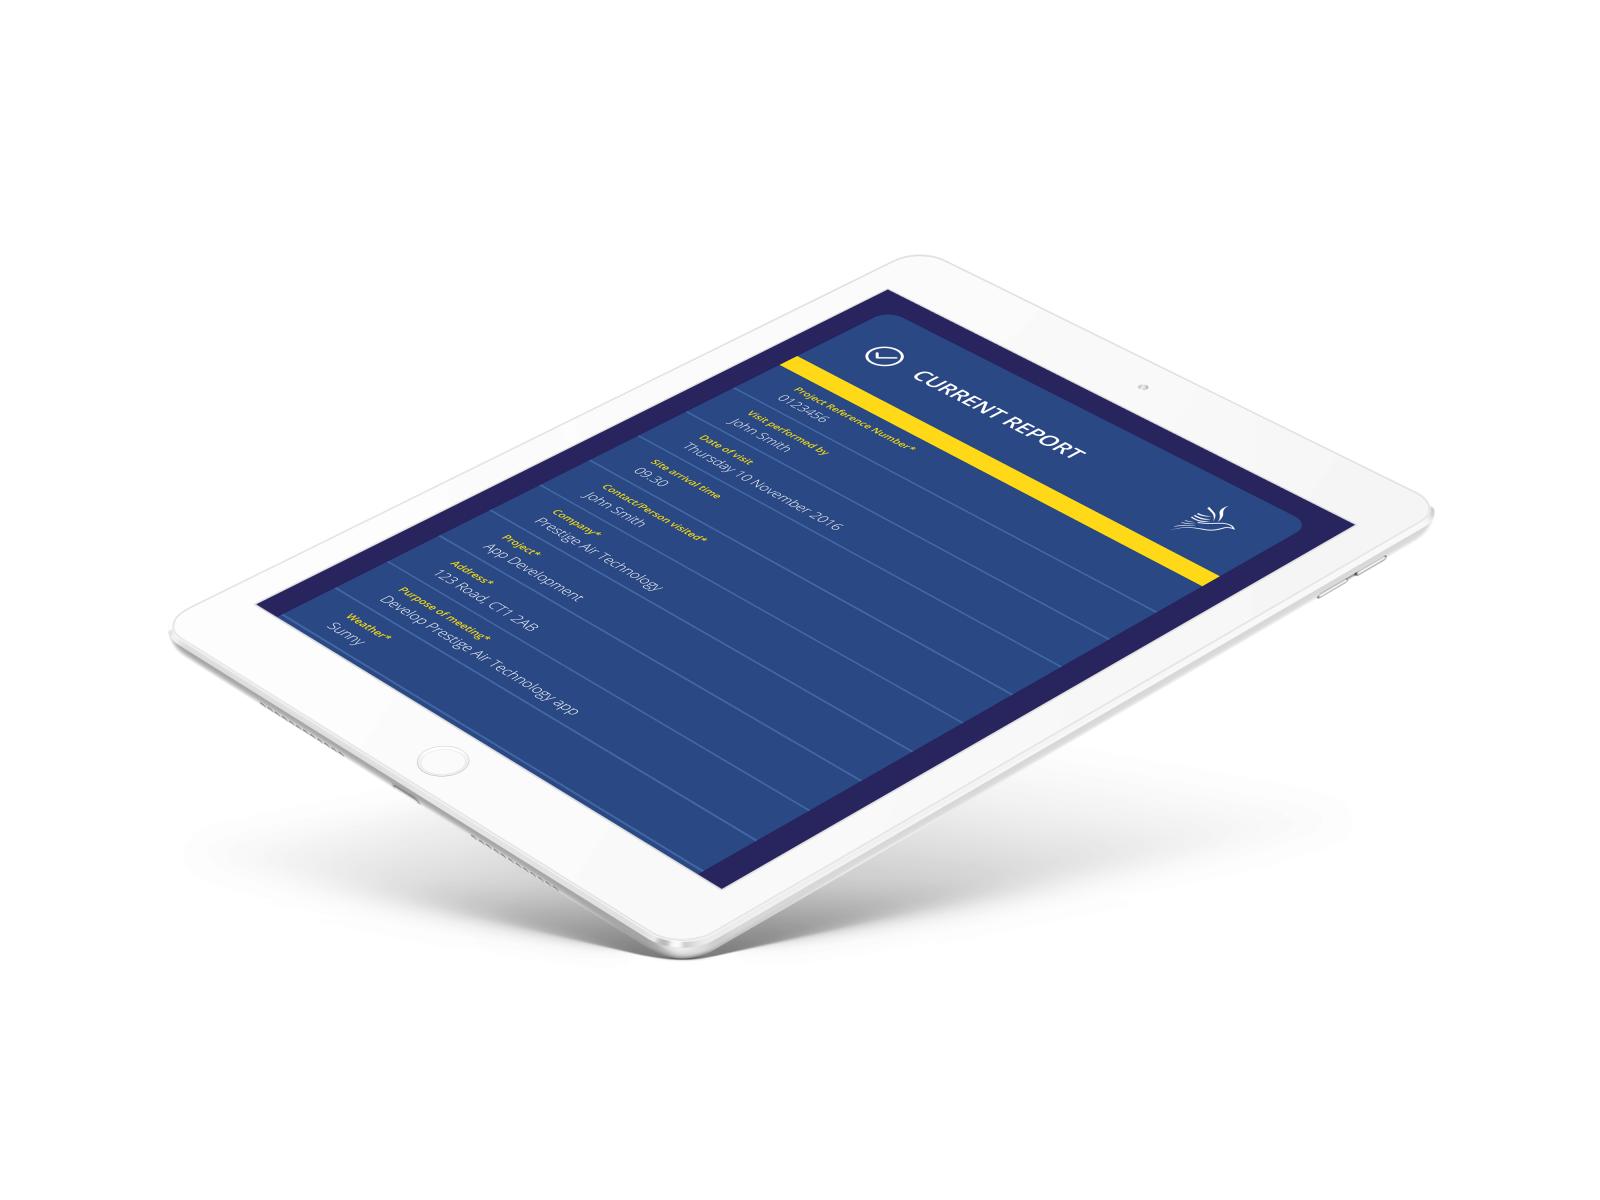 Prestige-app-ui-design-agency-graphic-design-canterbury-02.png